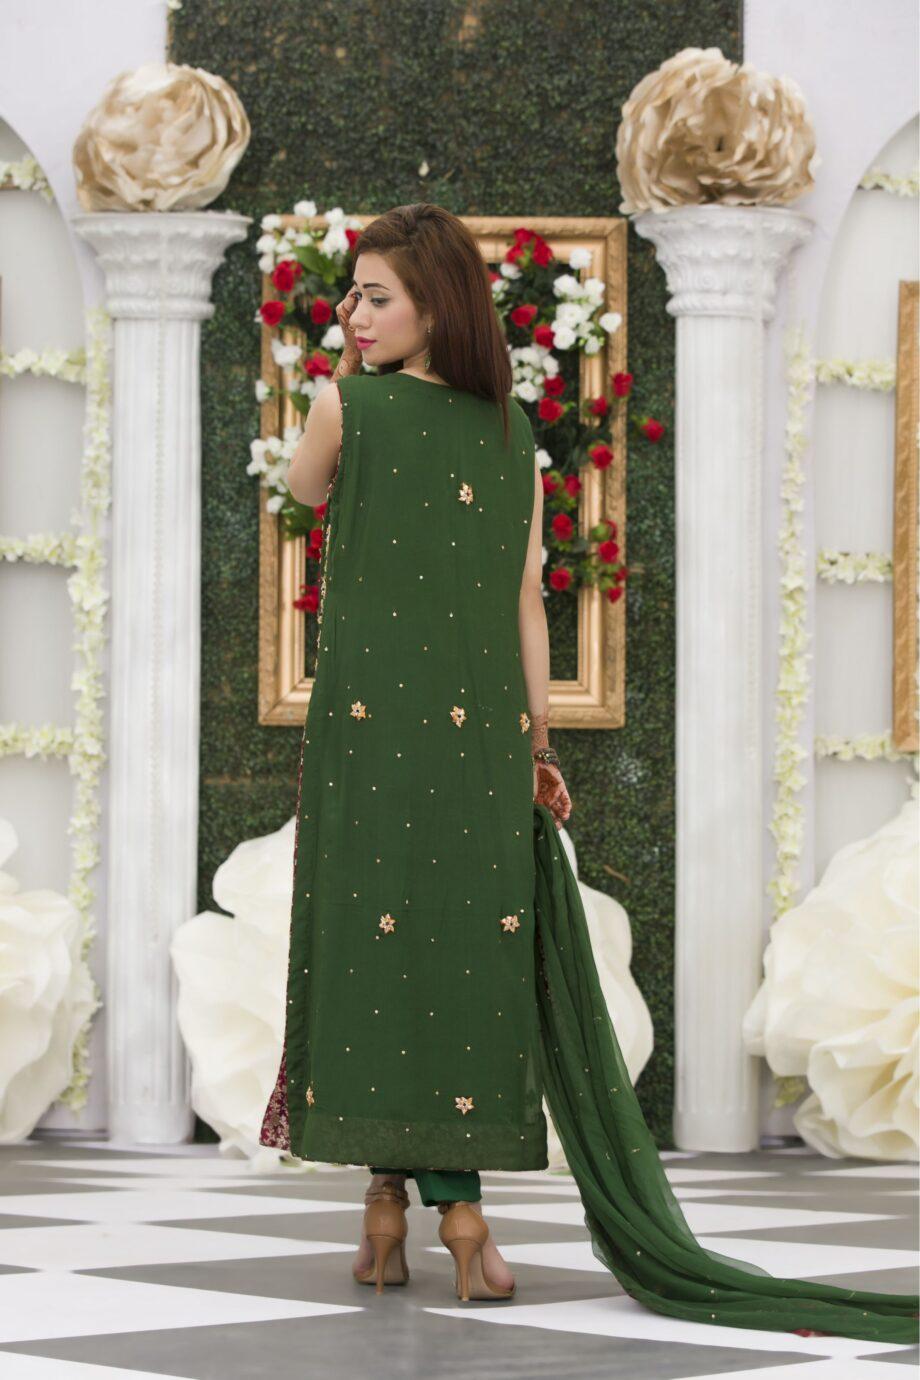 Buy Exclusive Bottle Green Mehndi Dress Online In USA, Uk & Pakistan - 01